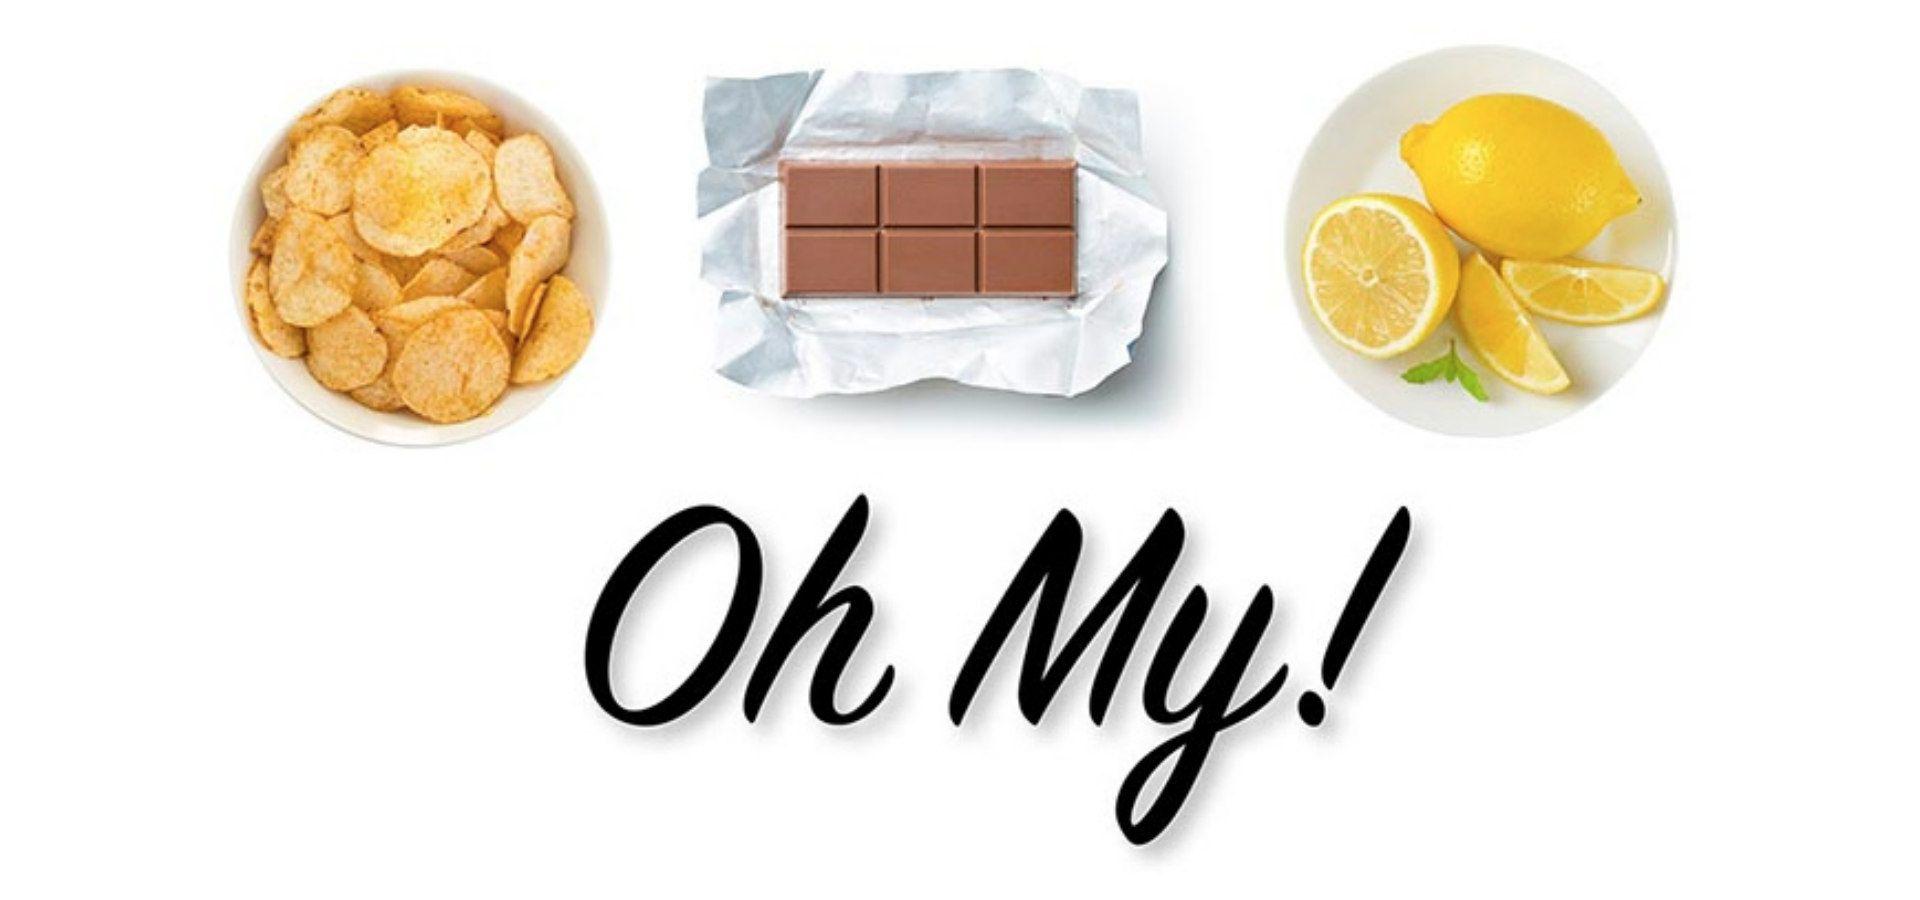 CHIPS… CHOCOLATE… LEMONS?